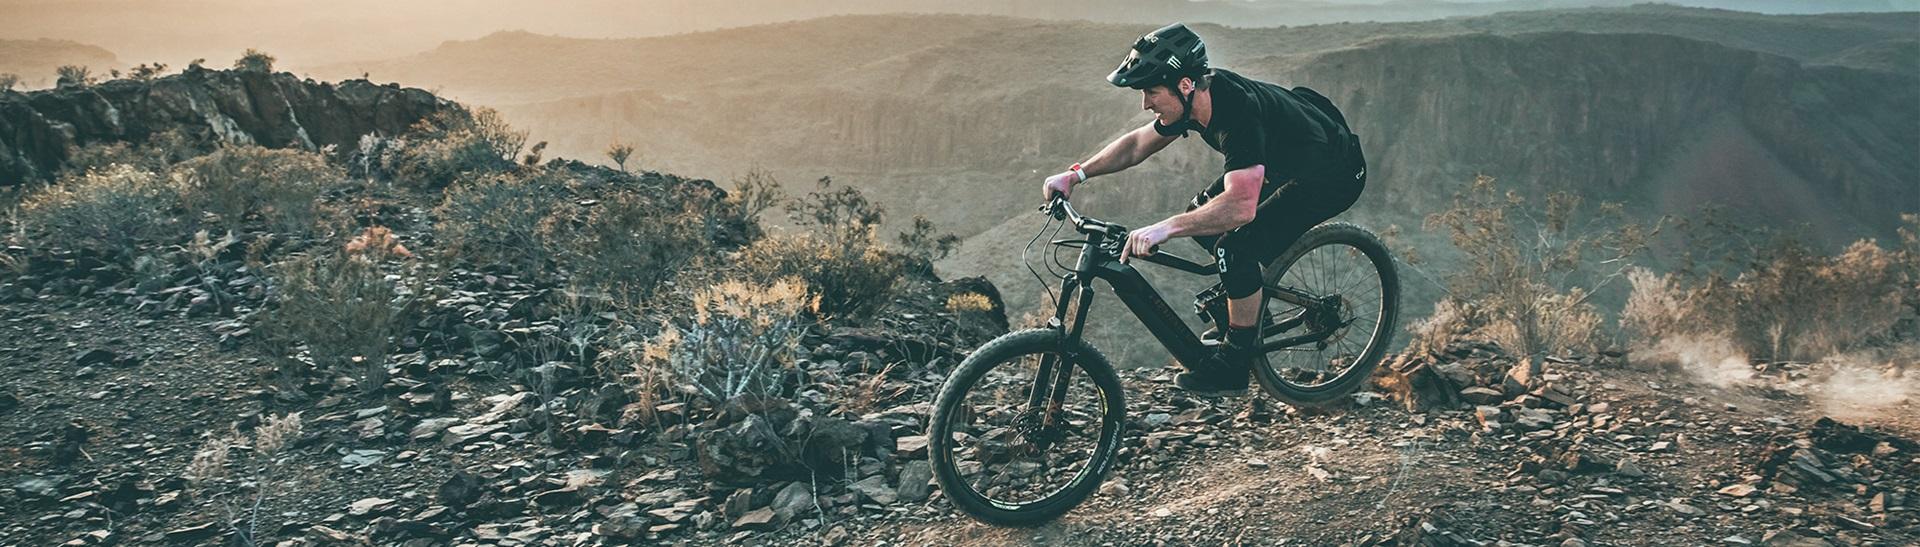 Electric All-Mountain Bikes